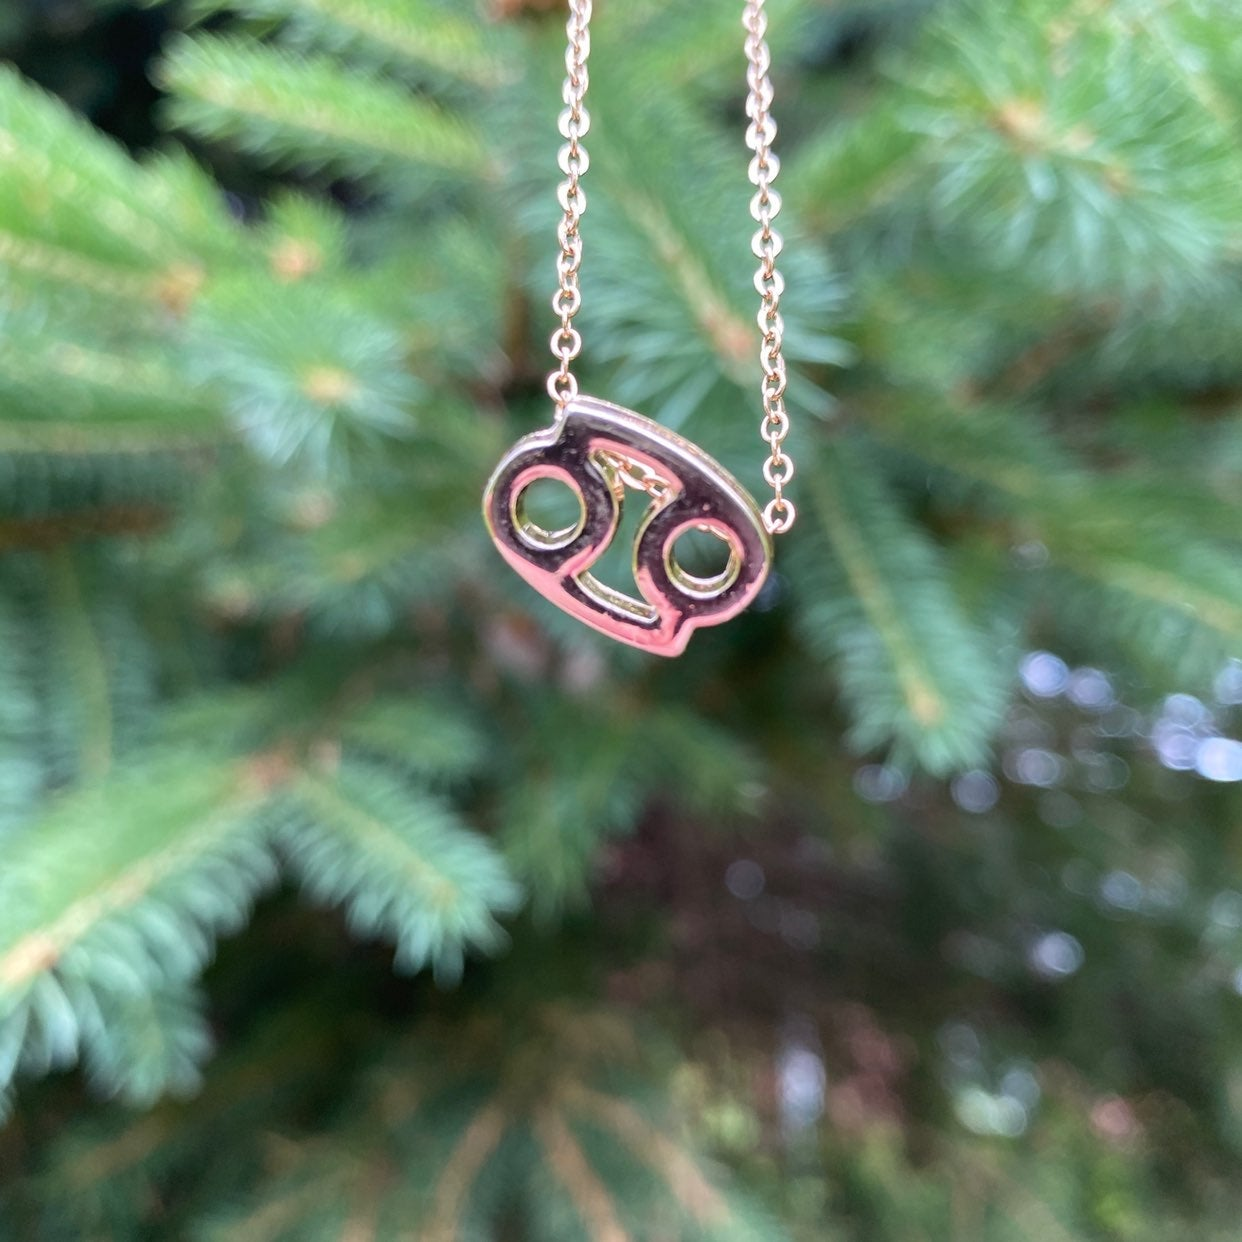 Cancer Necklace - Gold, Astrology,Zodiac